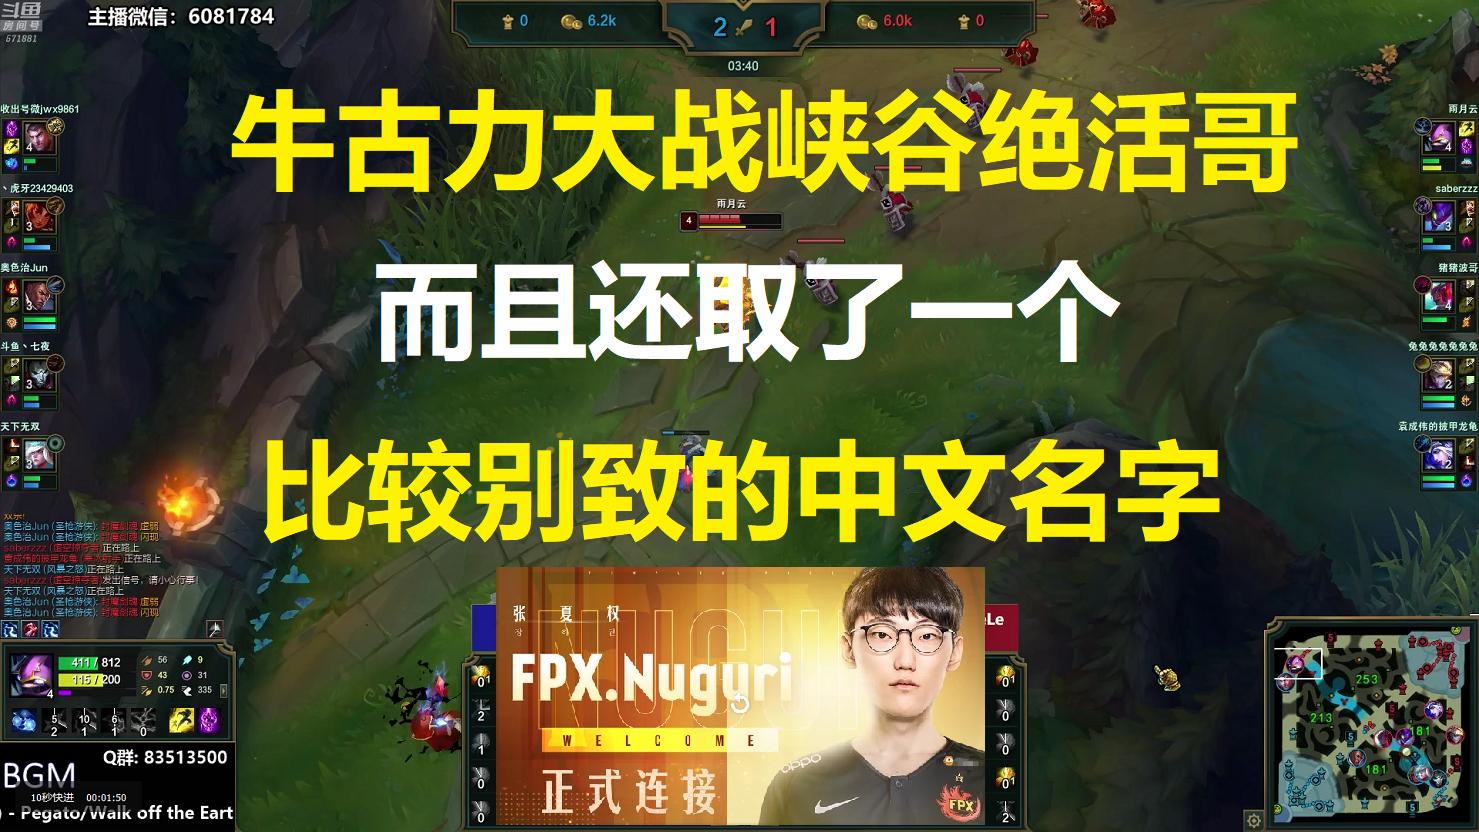 FPX牛古力大战峡谷绝活哥,而且还取了一个很别致的中文名字!